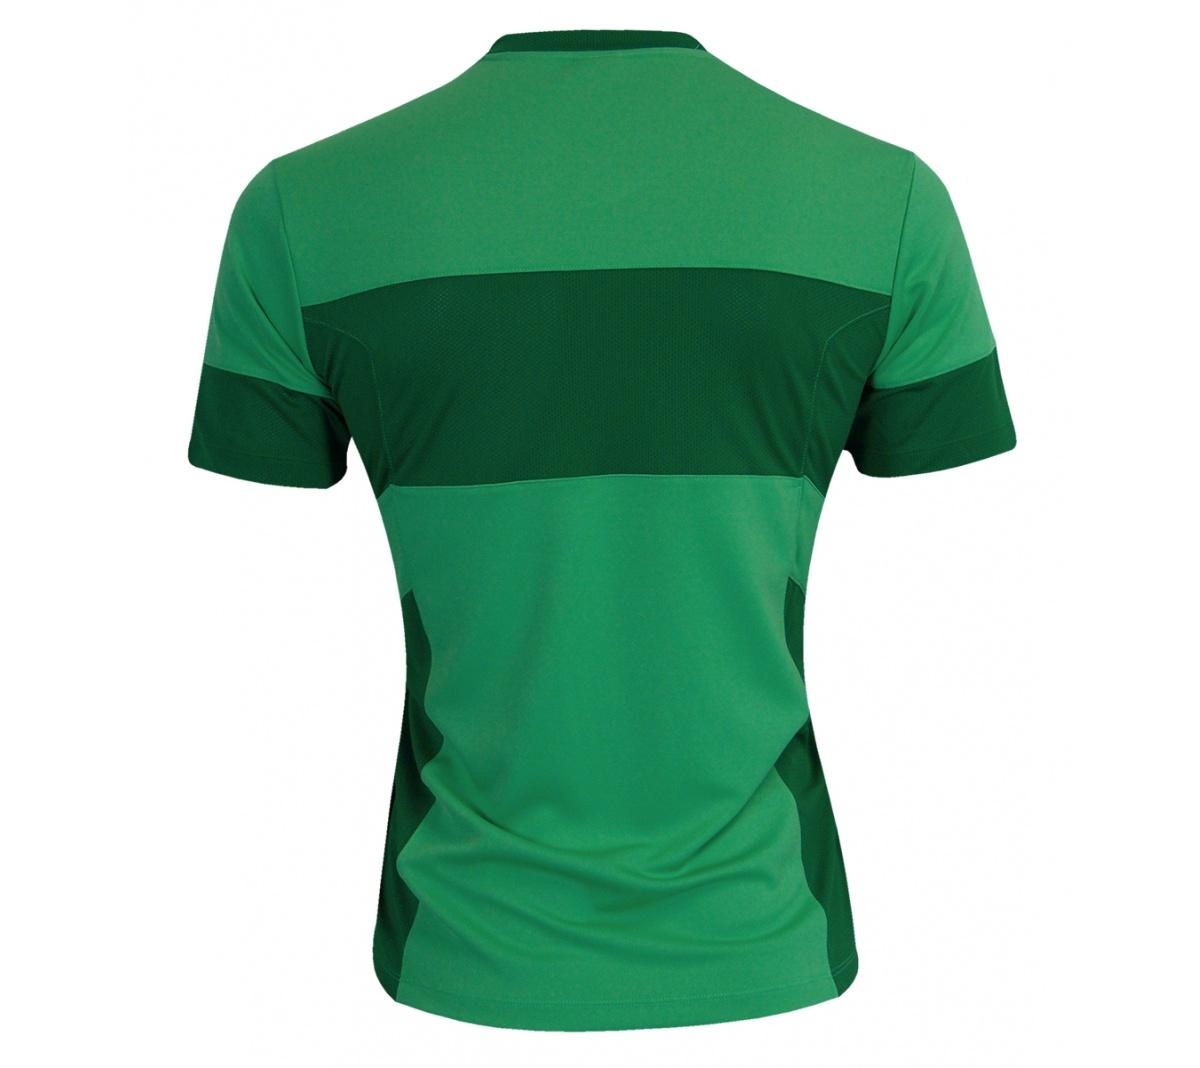 Camisa Nike Academy SS Verde - Mundo do Futebol cfbf718bbaa05